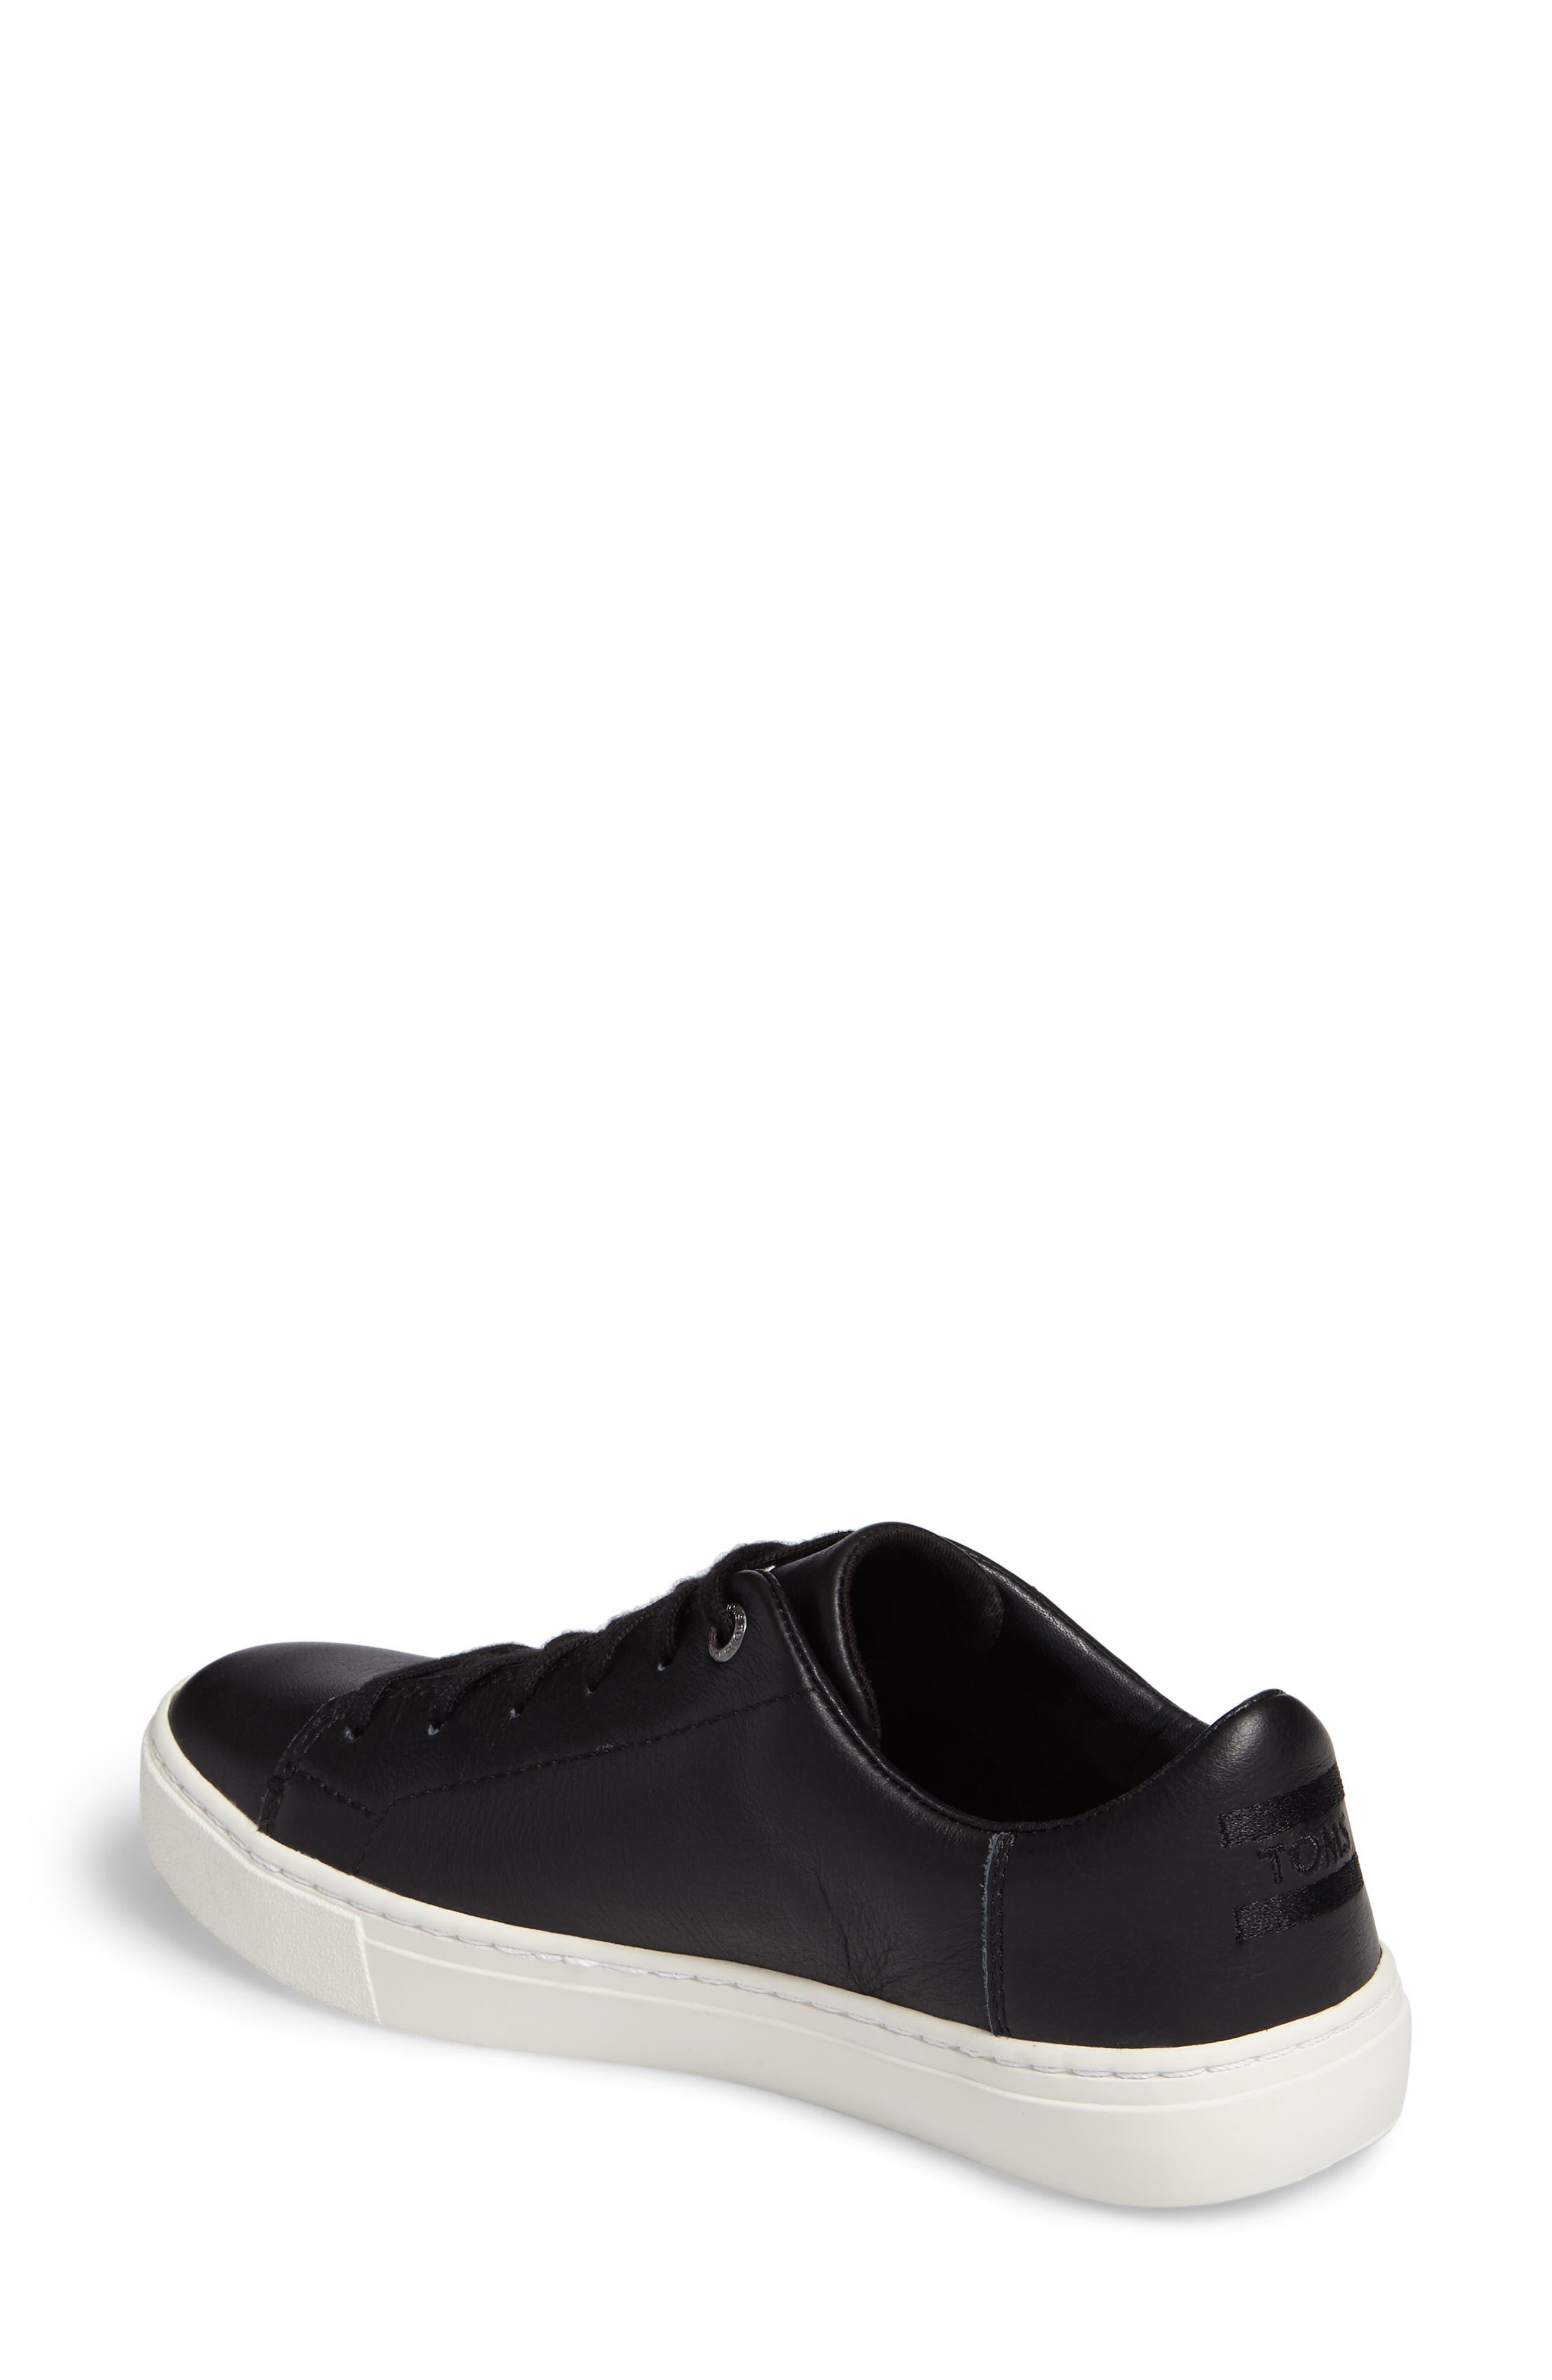 Lenox Sneaker,                             Alternate thumbnail 2, color,                             001